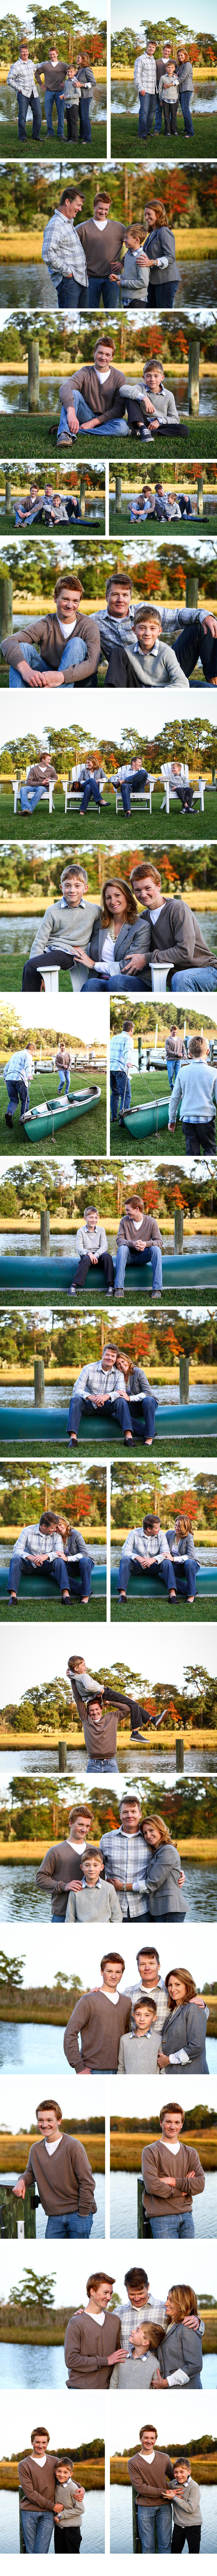 Thompsonfamilyblogpost